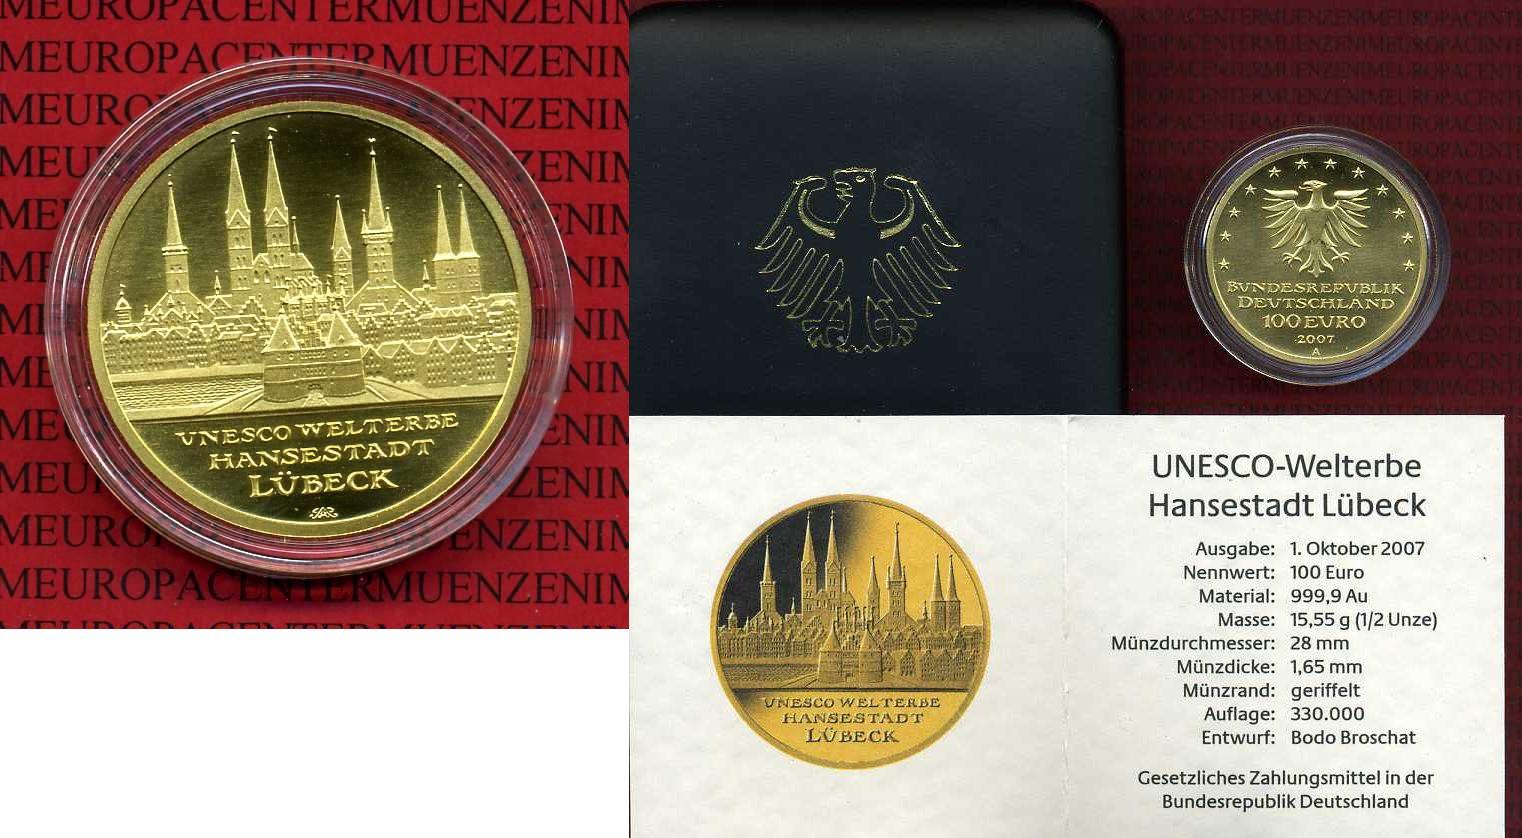 100 euro goldm nze 1 2 unze 2007 a deutschland brd germany unesco serie weltkulturerbe l beck. Black Bedroom Furniture Sets. Home Design Ideas